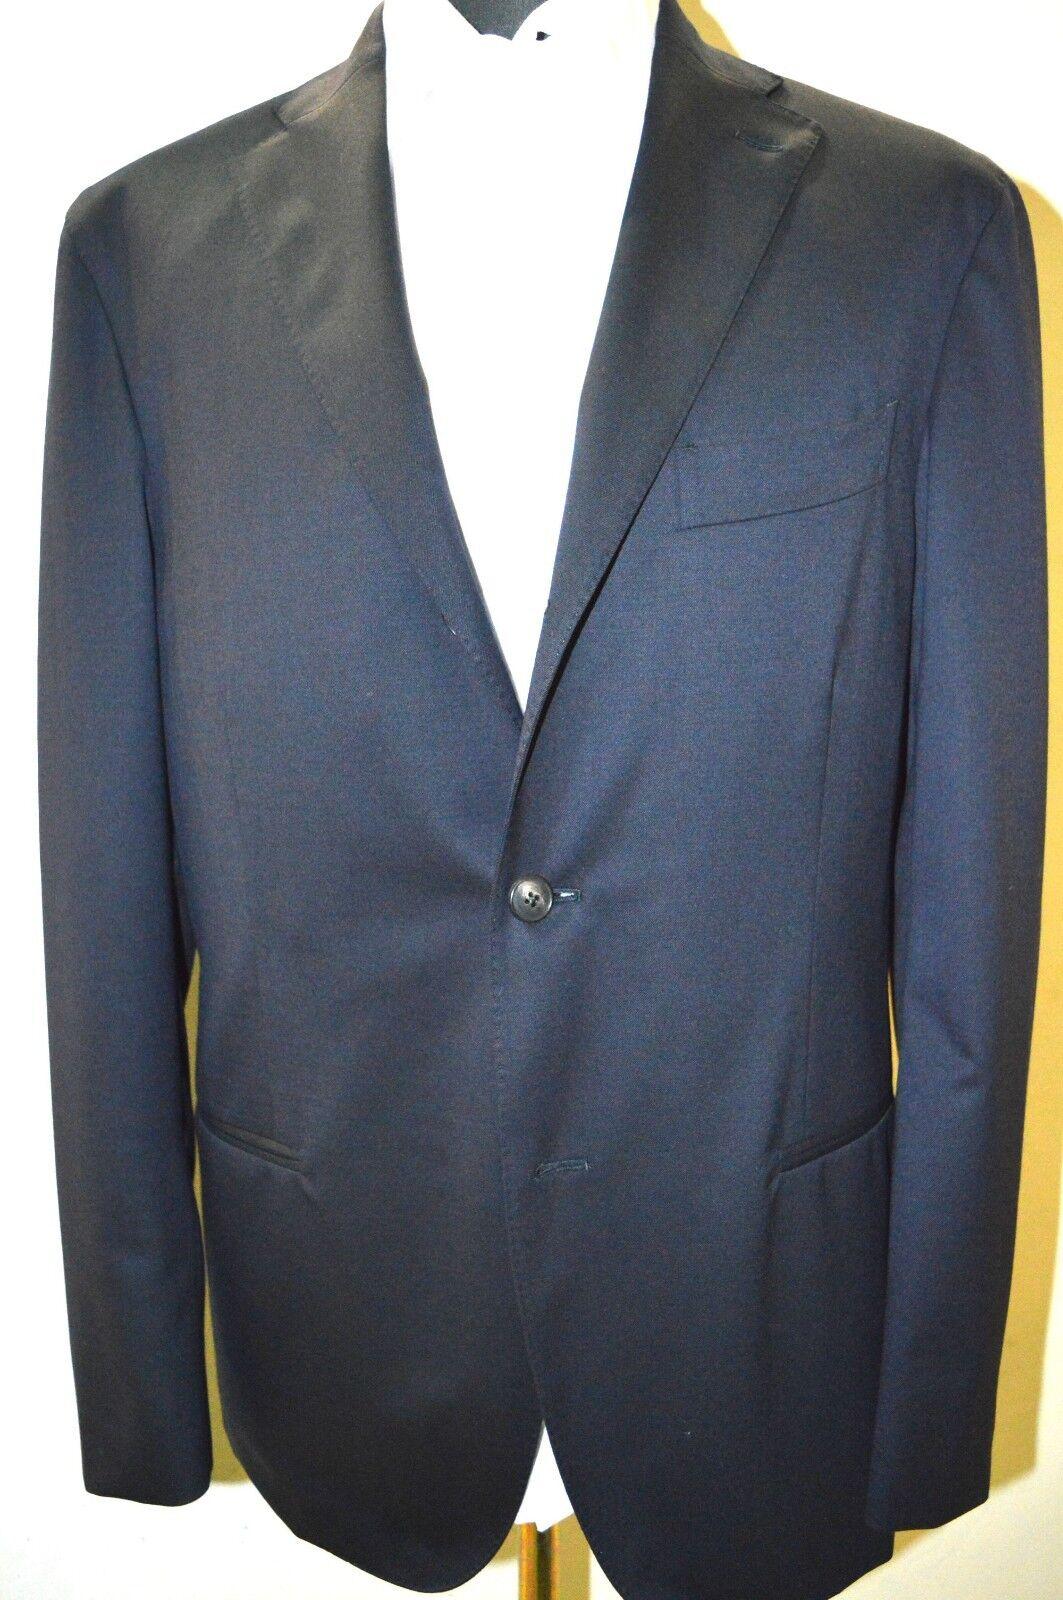 NEW BOGLIOLI Milano K Jacket Blau Suit  100% Wool Größe 40 Us 50 Eu 2BTN